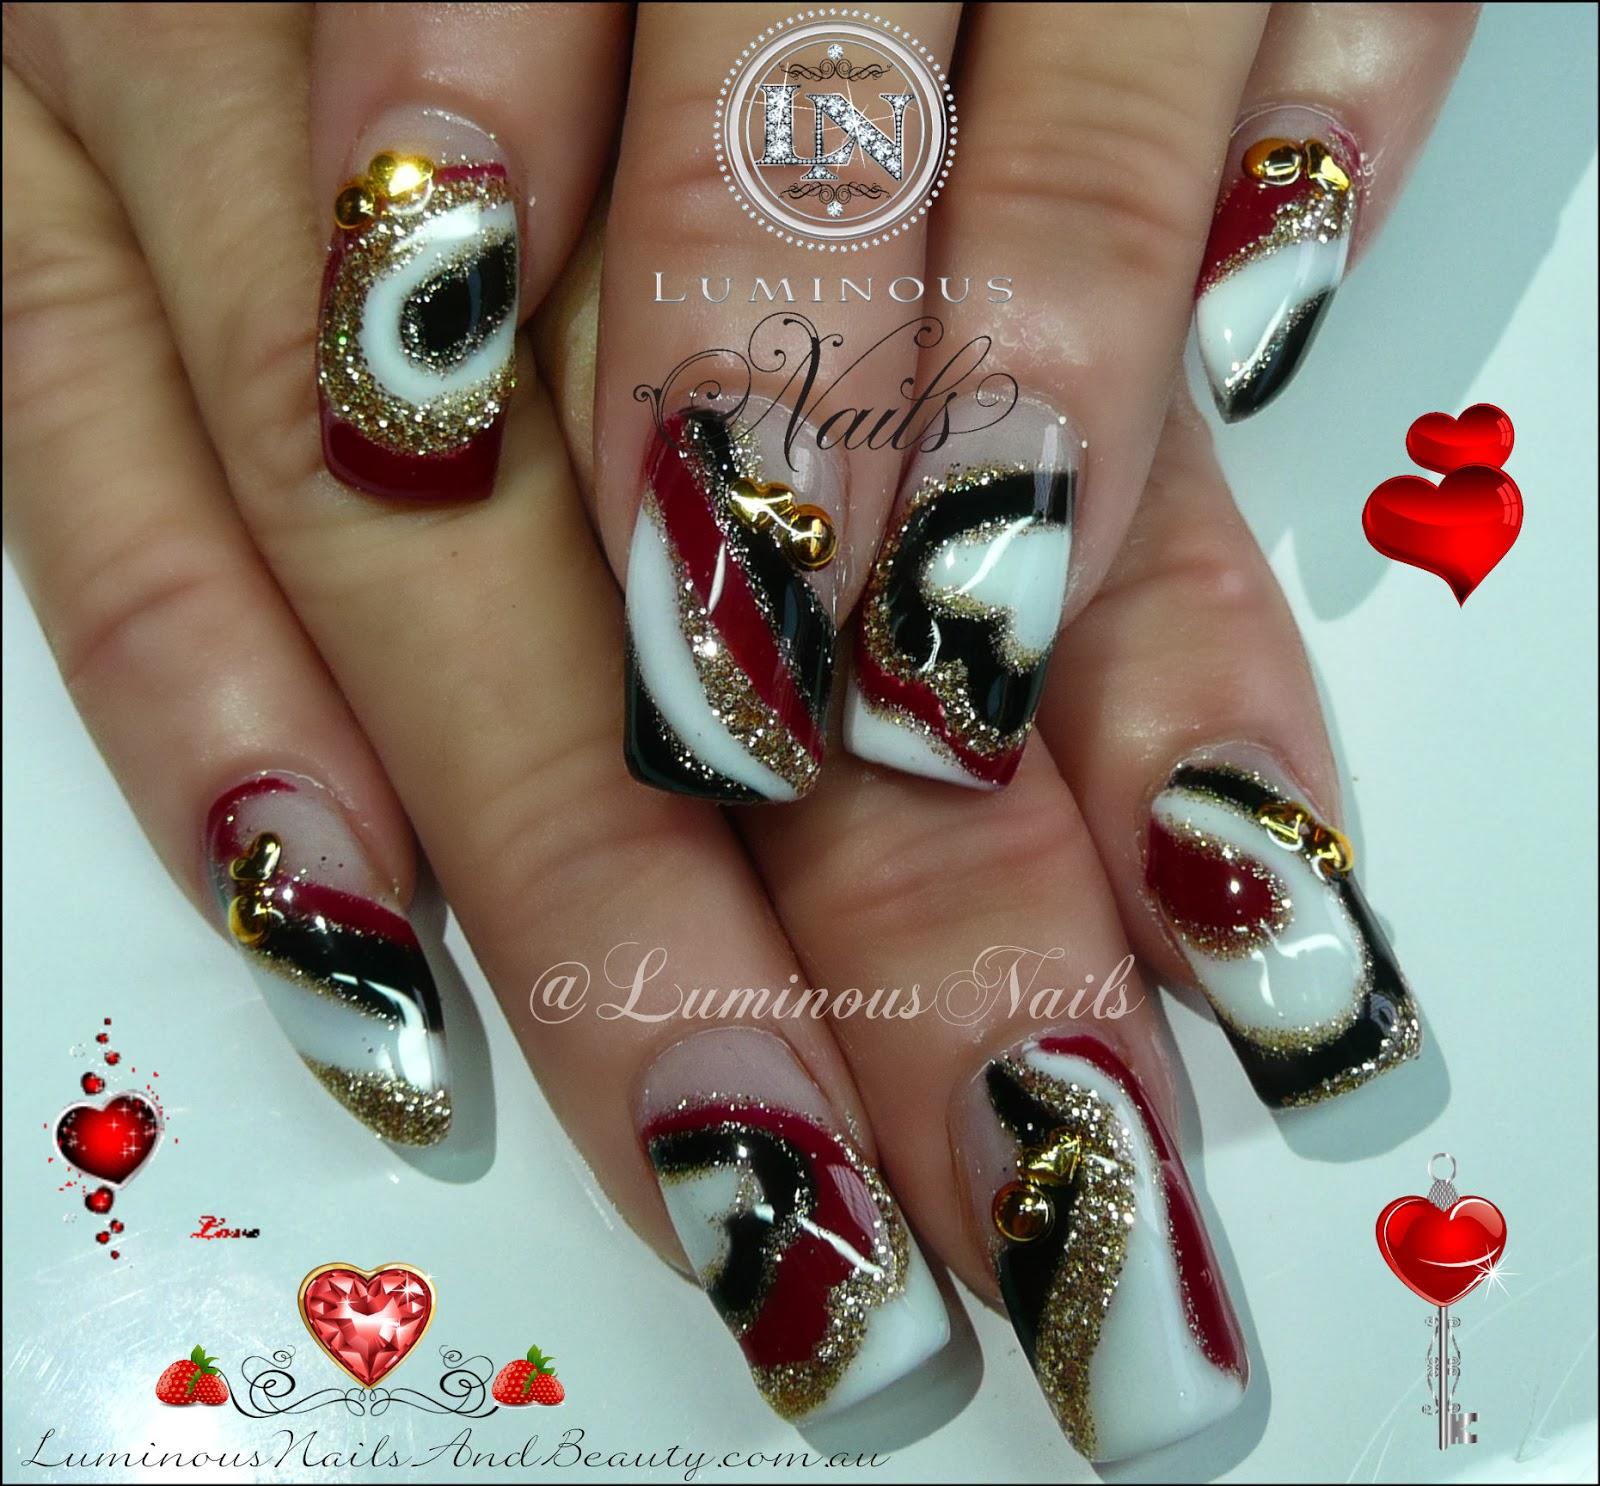 Black And White Valentines Nail Art ~ Nails by kayla shevonne rose ...